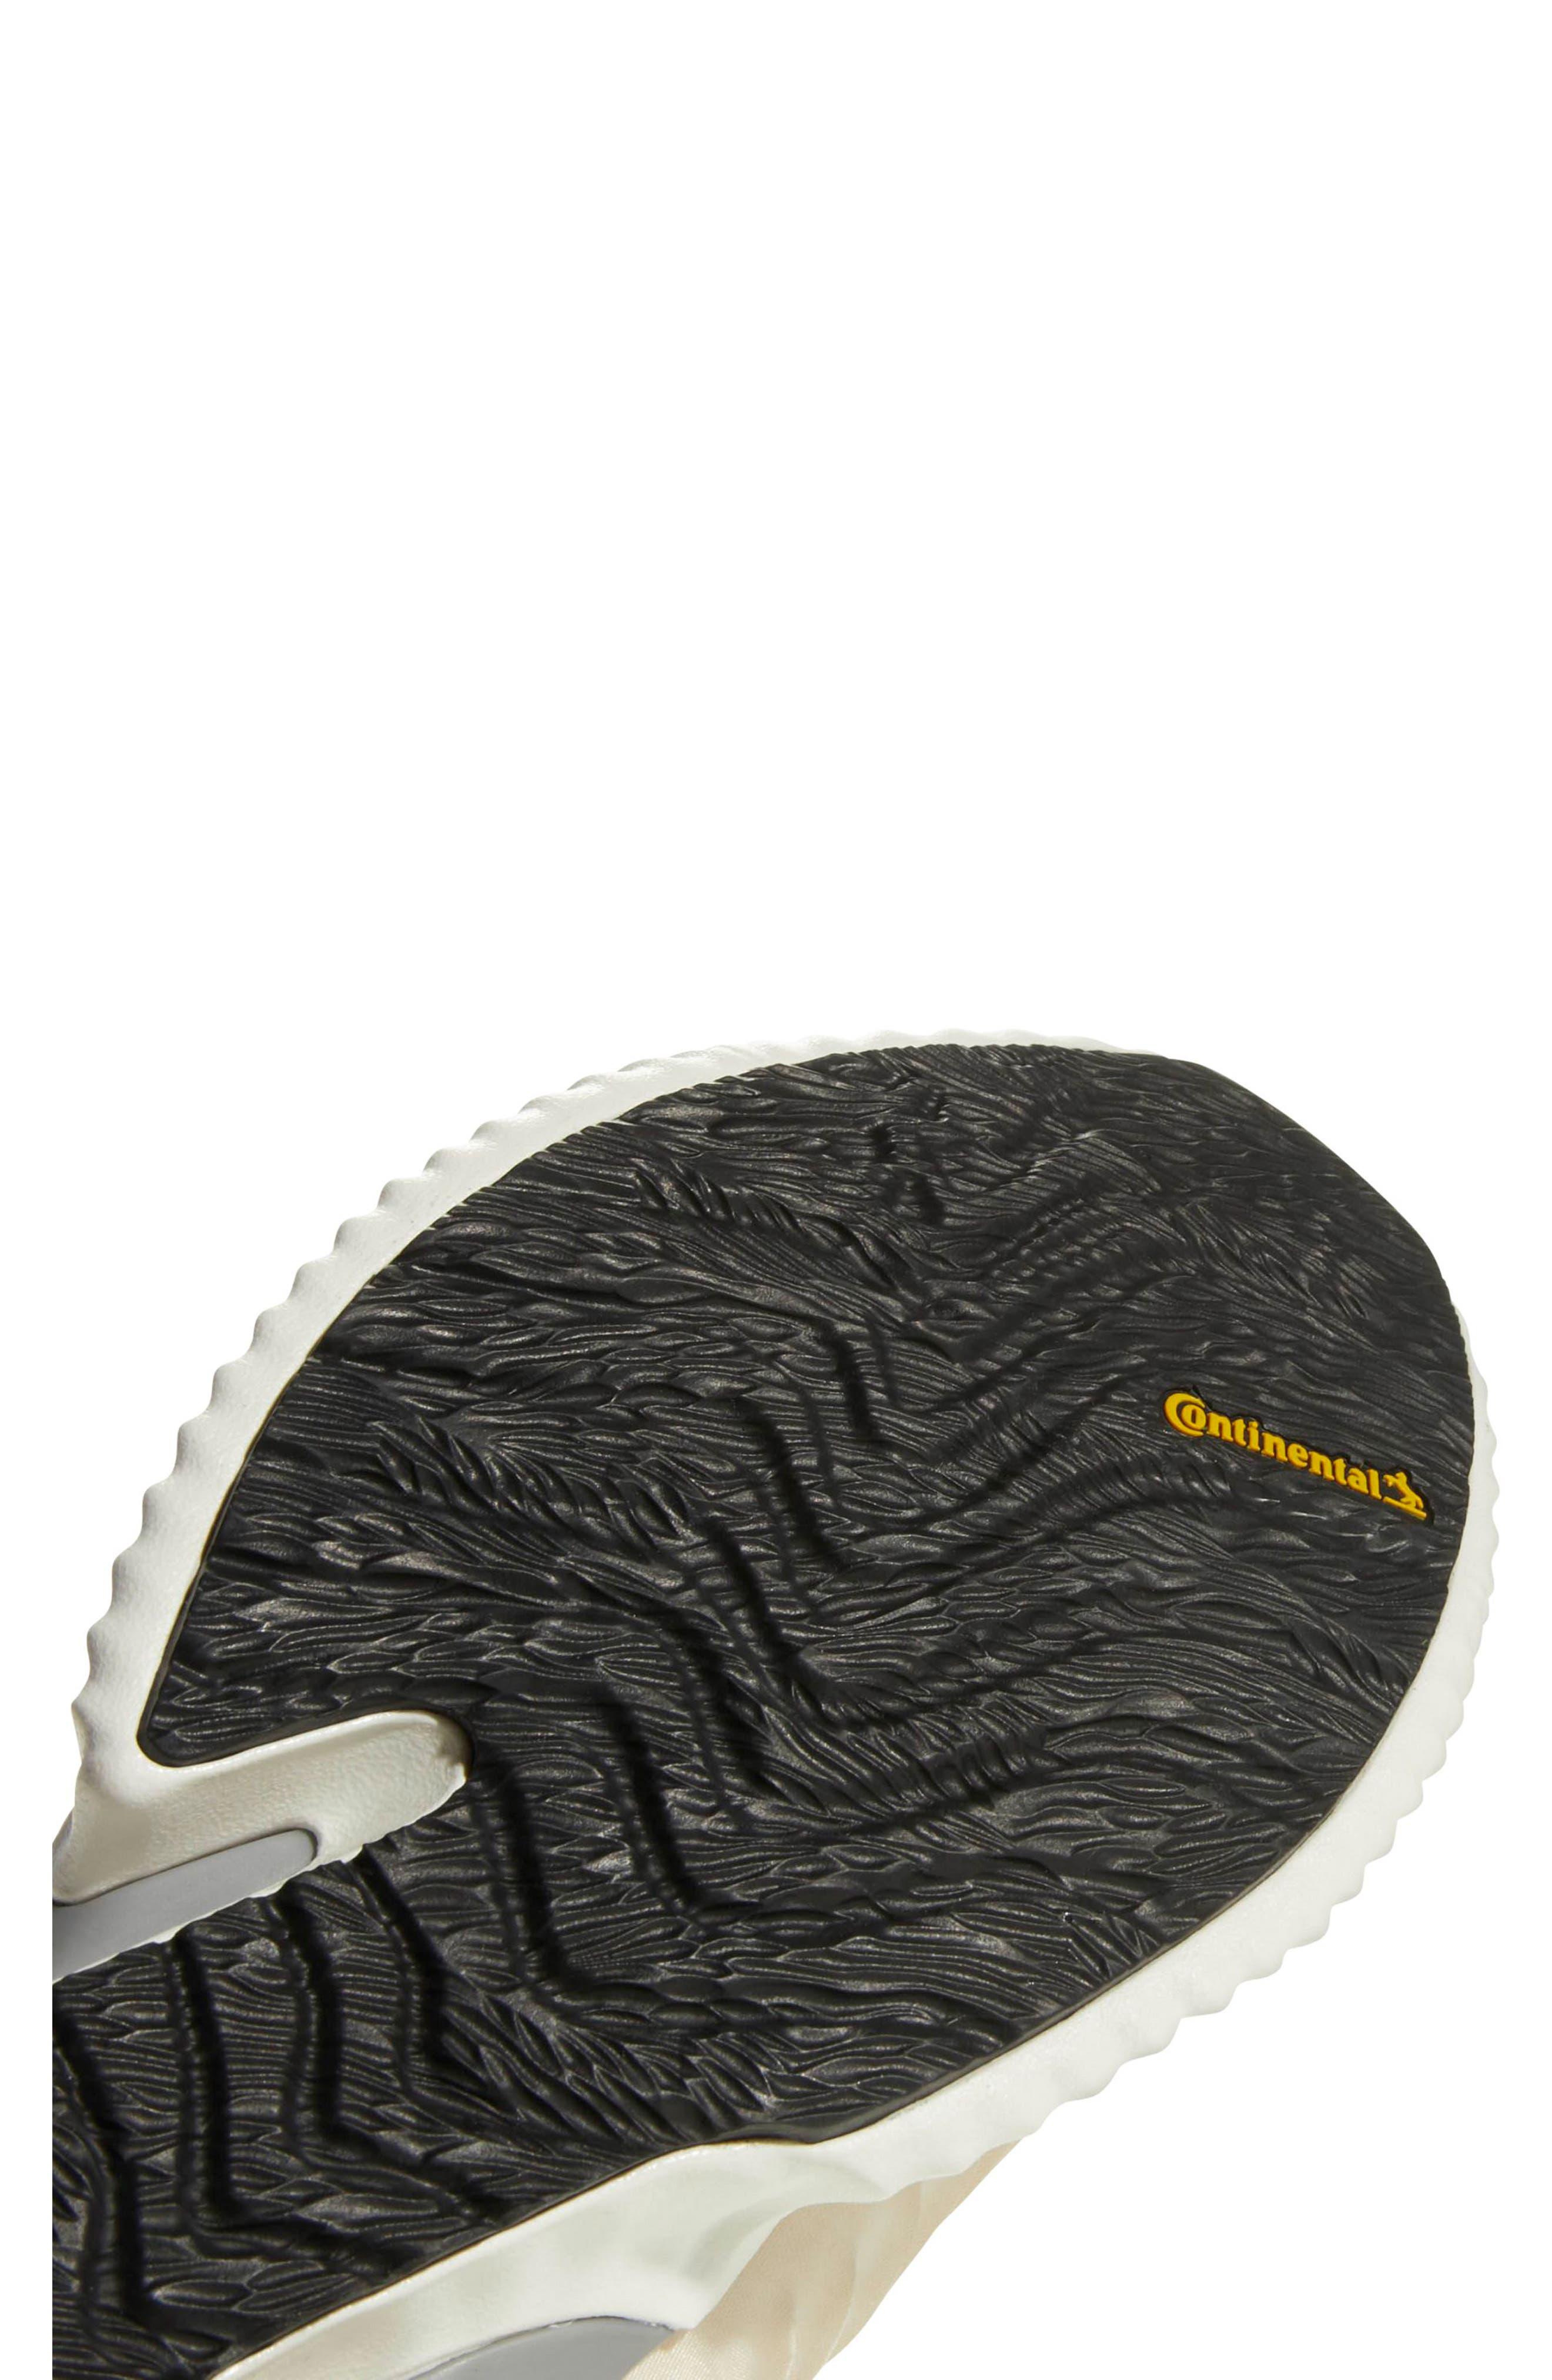 AlphaBounce Instinct Running Shoe,                             Alternate thumbnail 5, color,                             LINEN / CLOUD WHITE / GREY